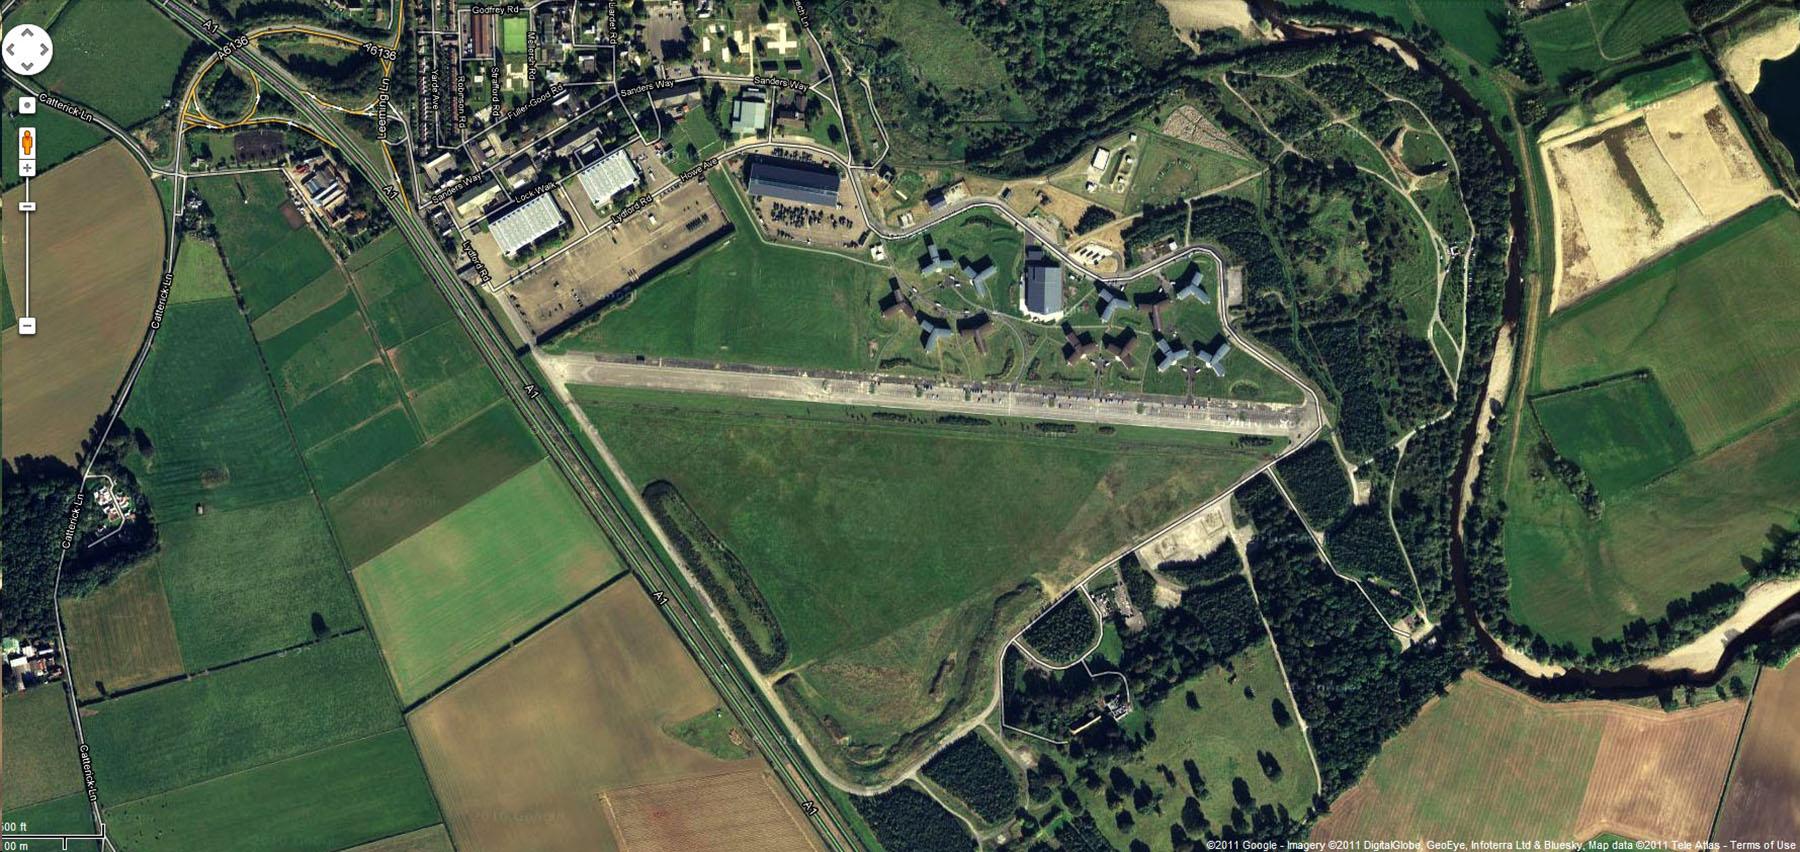 Airbase RAF Catterick 2011 01